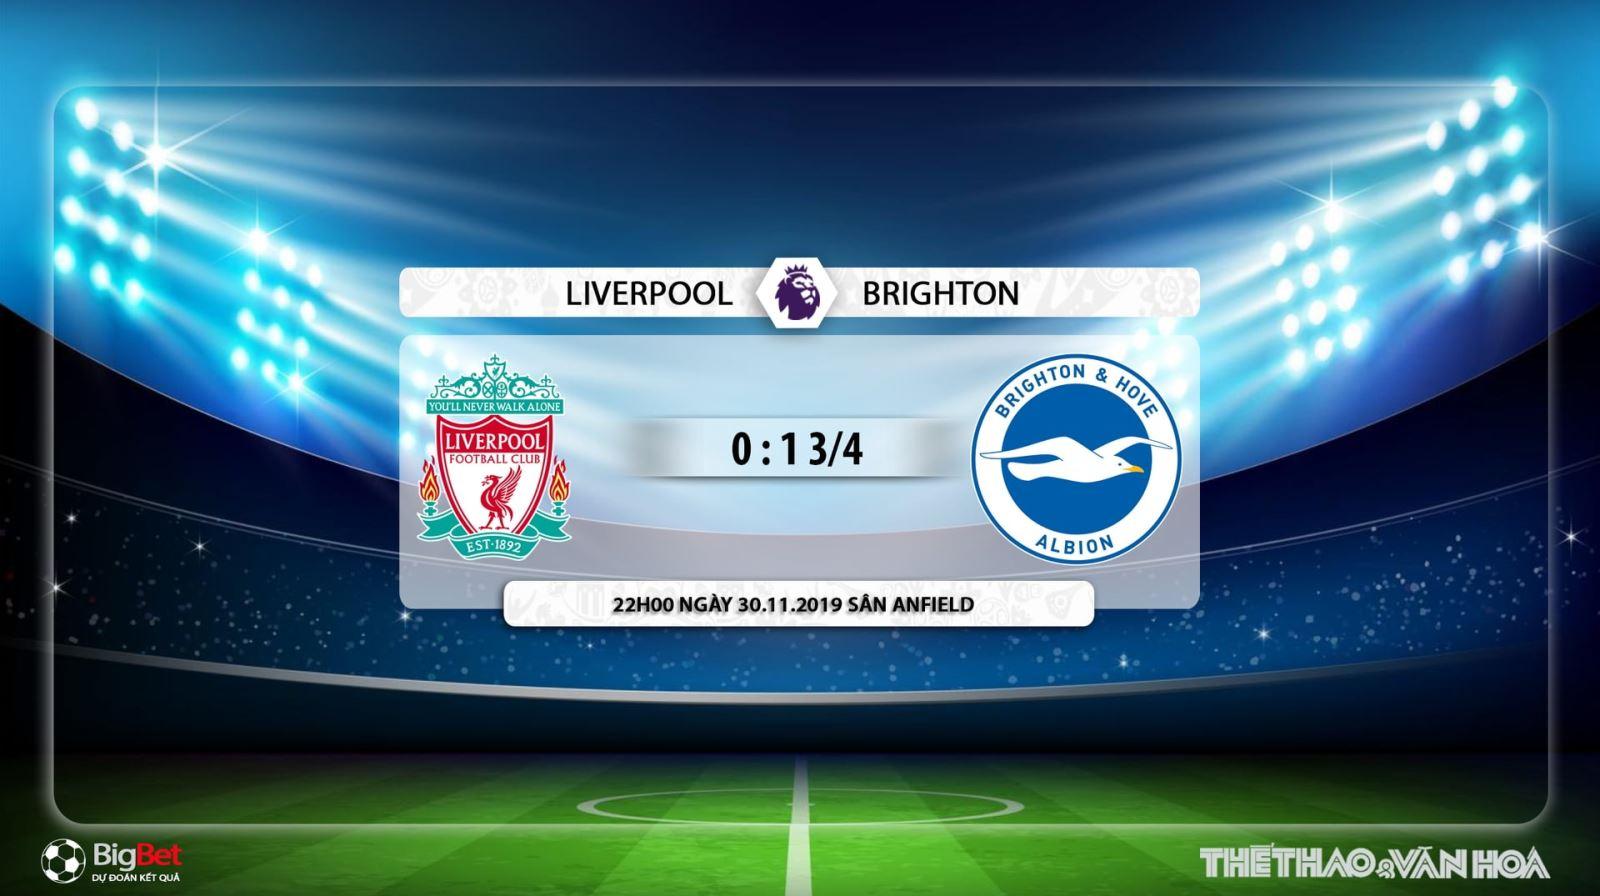 Liverpool vs Brighton , soi kèo,  soi kèo Liverpool vs Brighton, Liverpool, Brighton, trực tiếp bóng đá, trực tiếp Liverpool vs Brighton, K+, K+PC